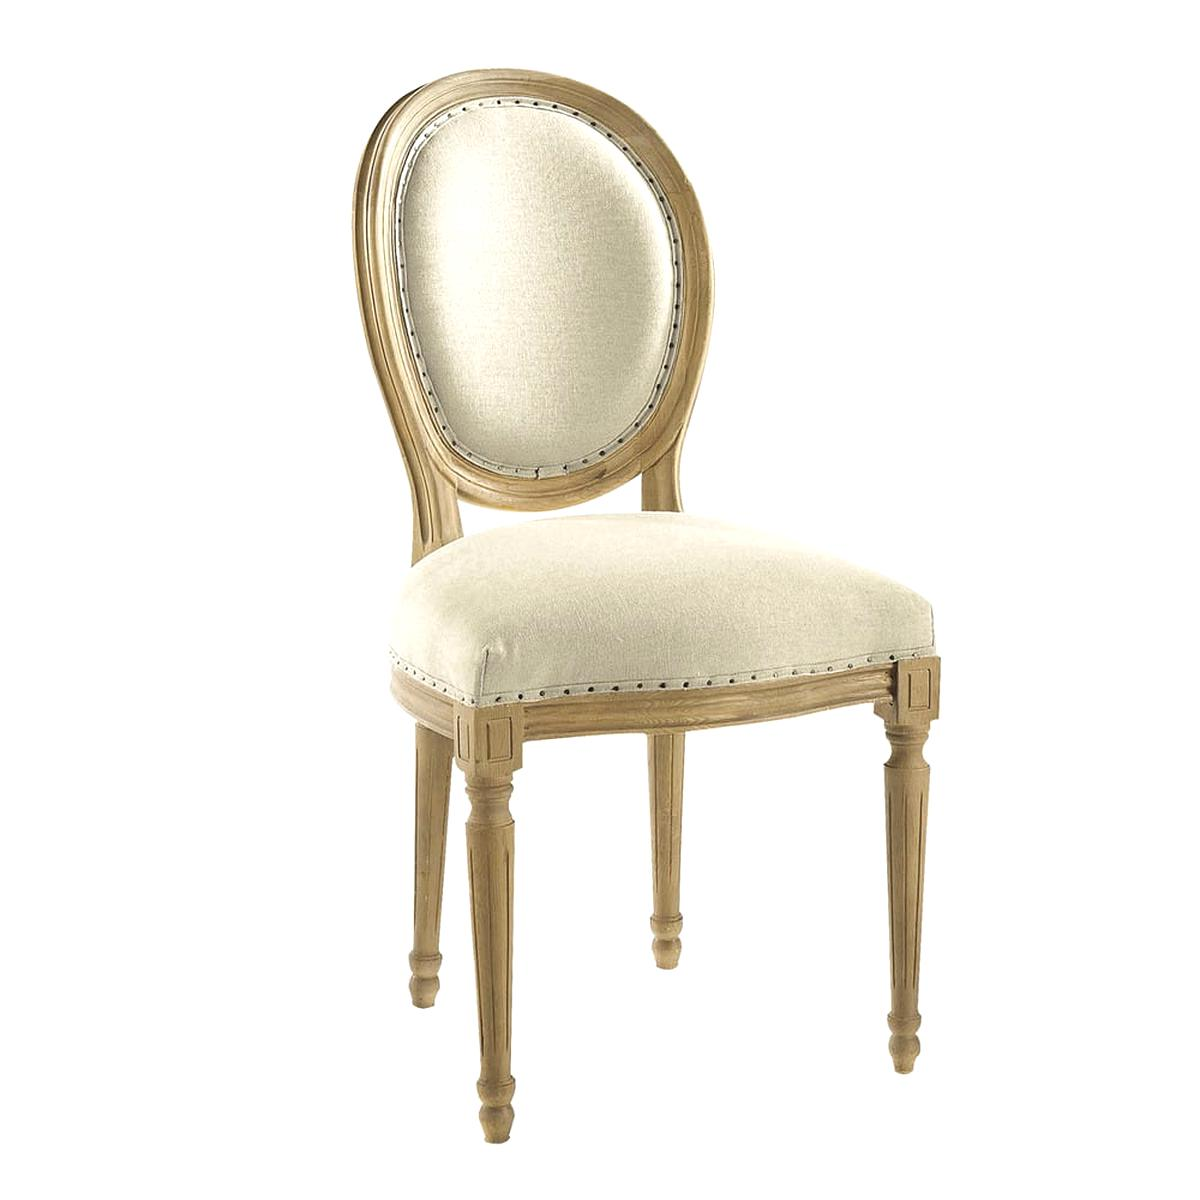 Renover Une Chaise Medaillon chaise medaillon maison monde d'occasion